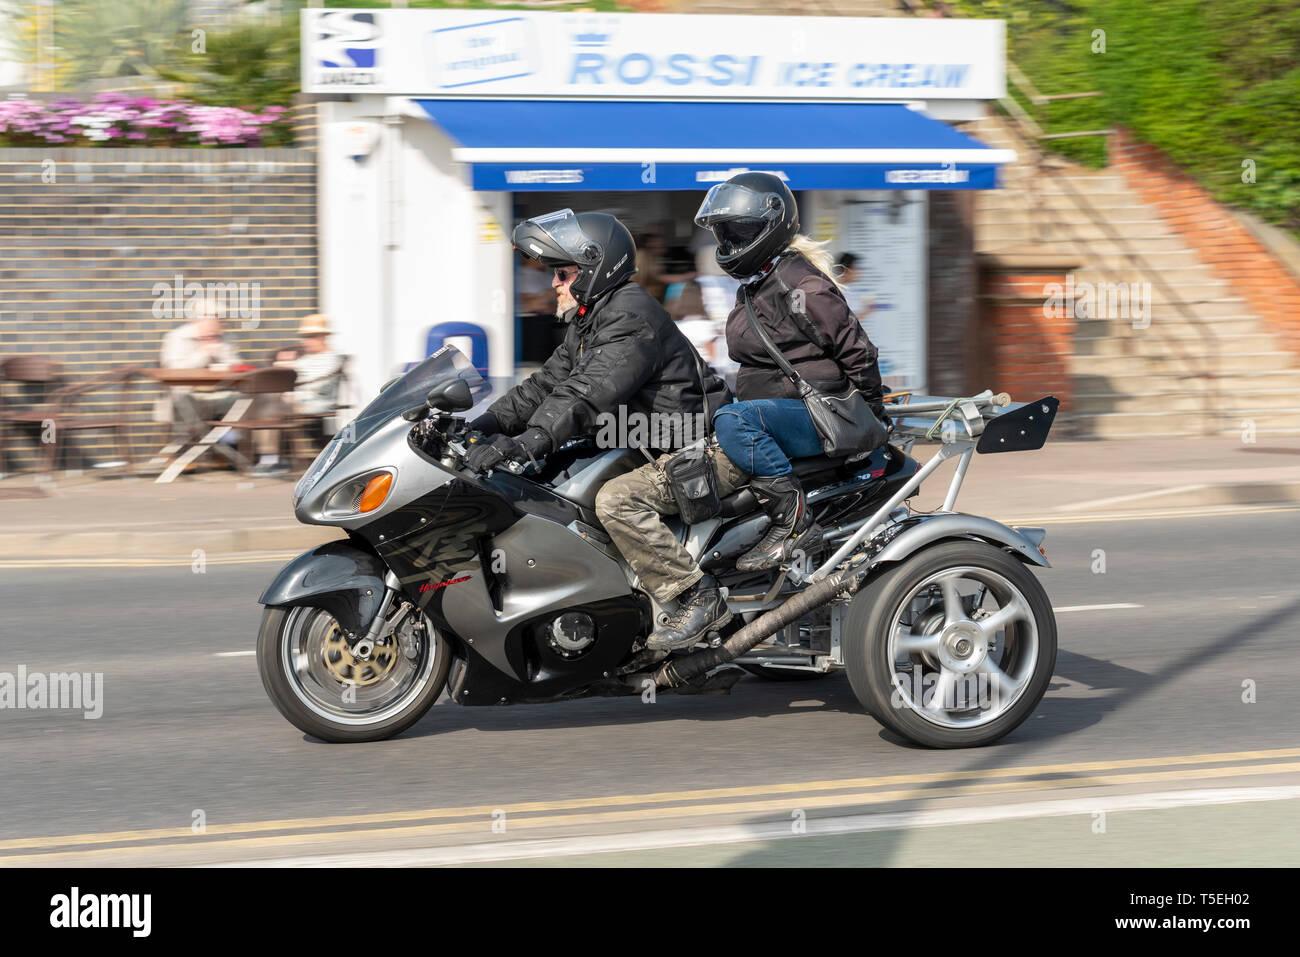 Three wheeled Suzuki Hayabusa GSX1300R at the Southend Shakedown Resurrection motorcycle rally event, Southend on Sea, Essex, UK Stock Photo